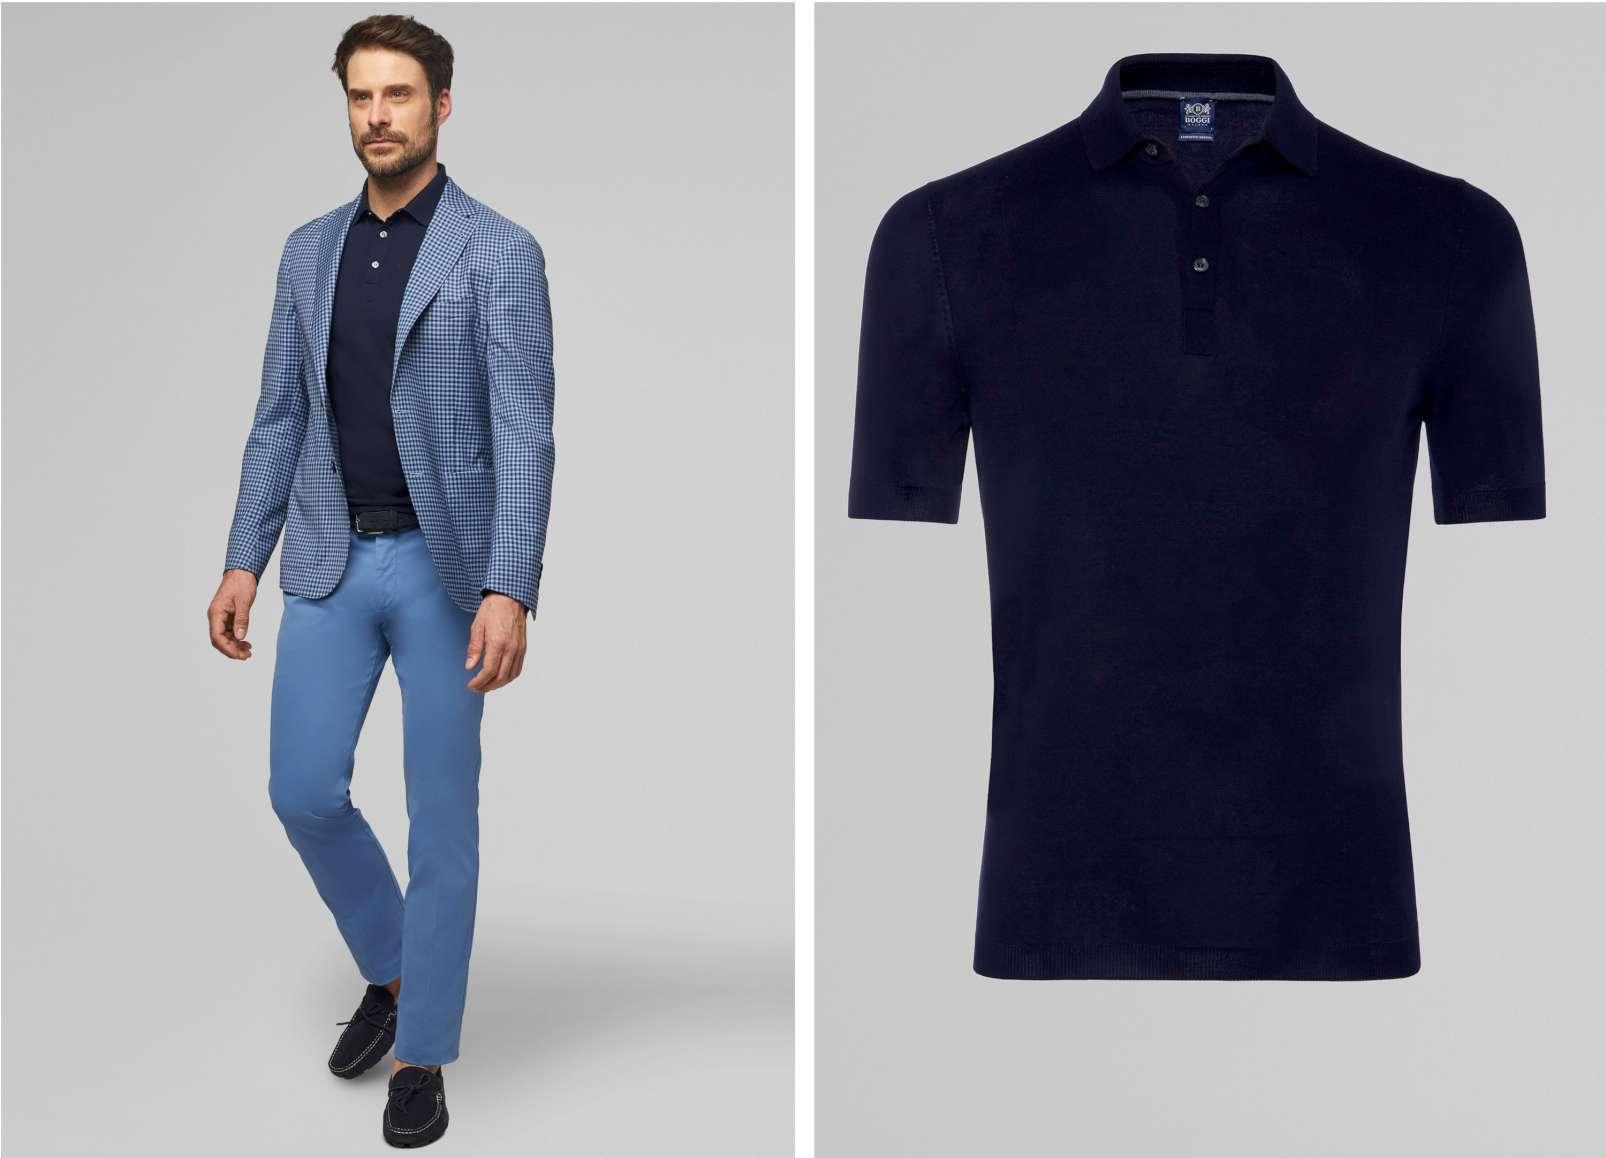 Boggi Milano polo shirt BO19P119202 Aria blazer BO19P101002